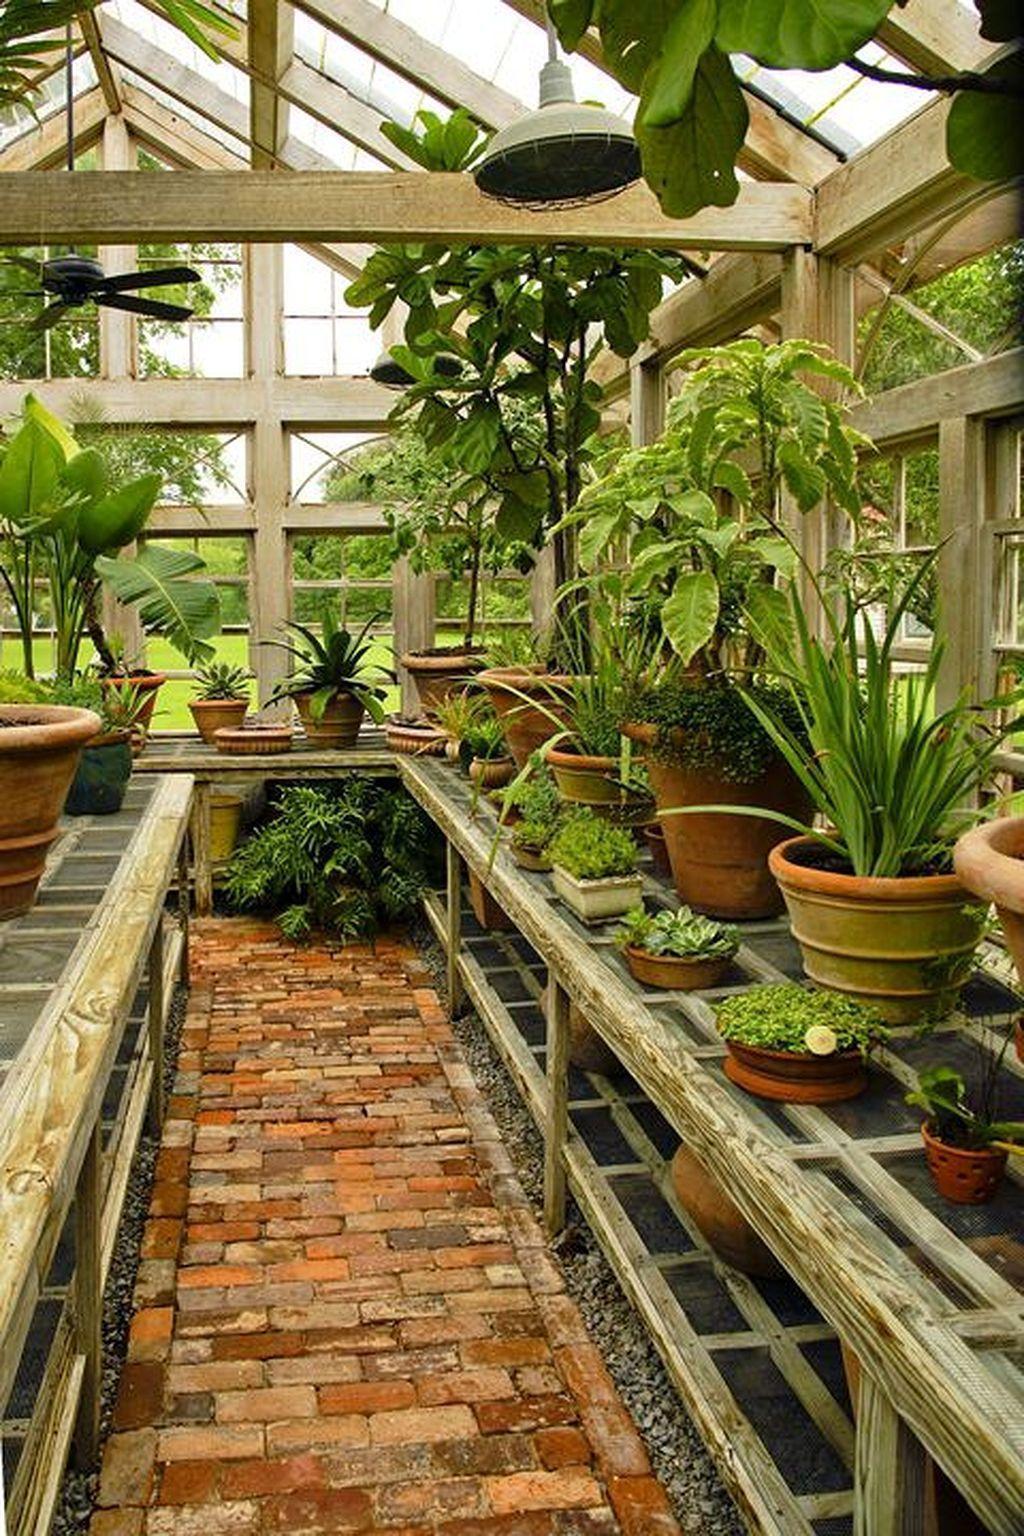 Greenhouse gardening for beginners ideas 7 | ~Flowers&Garden ...